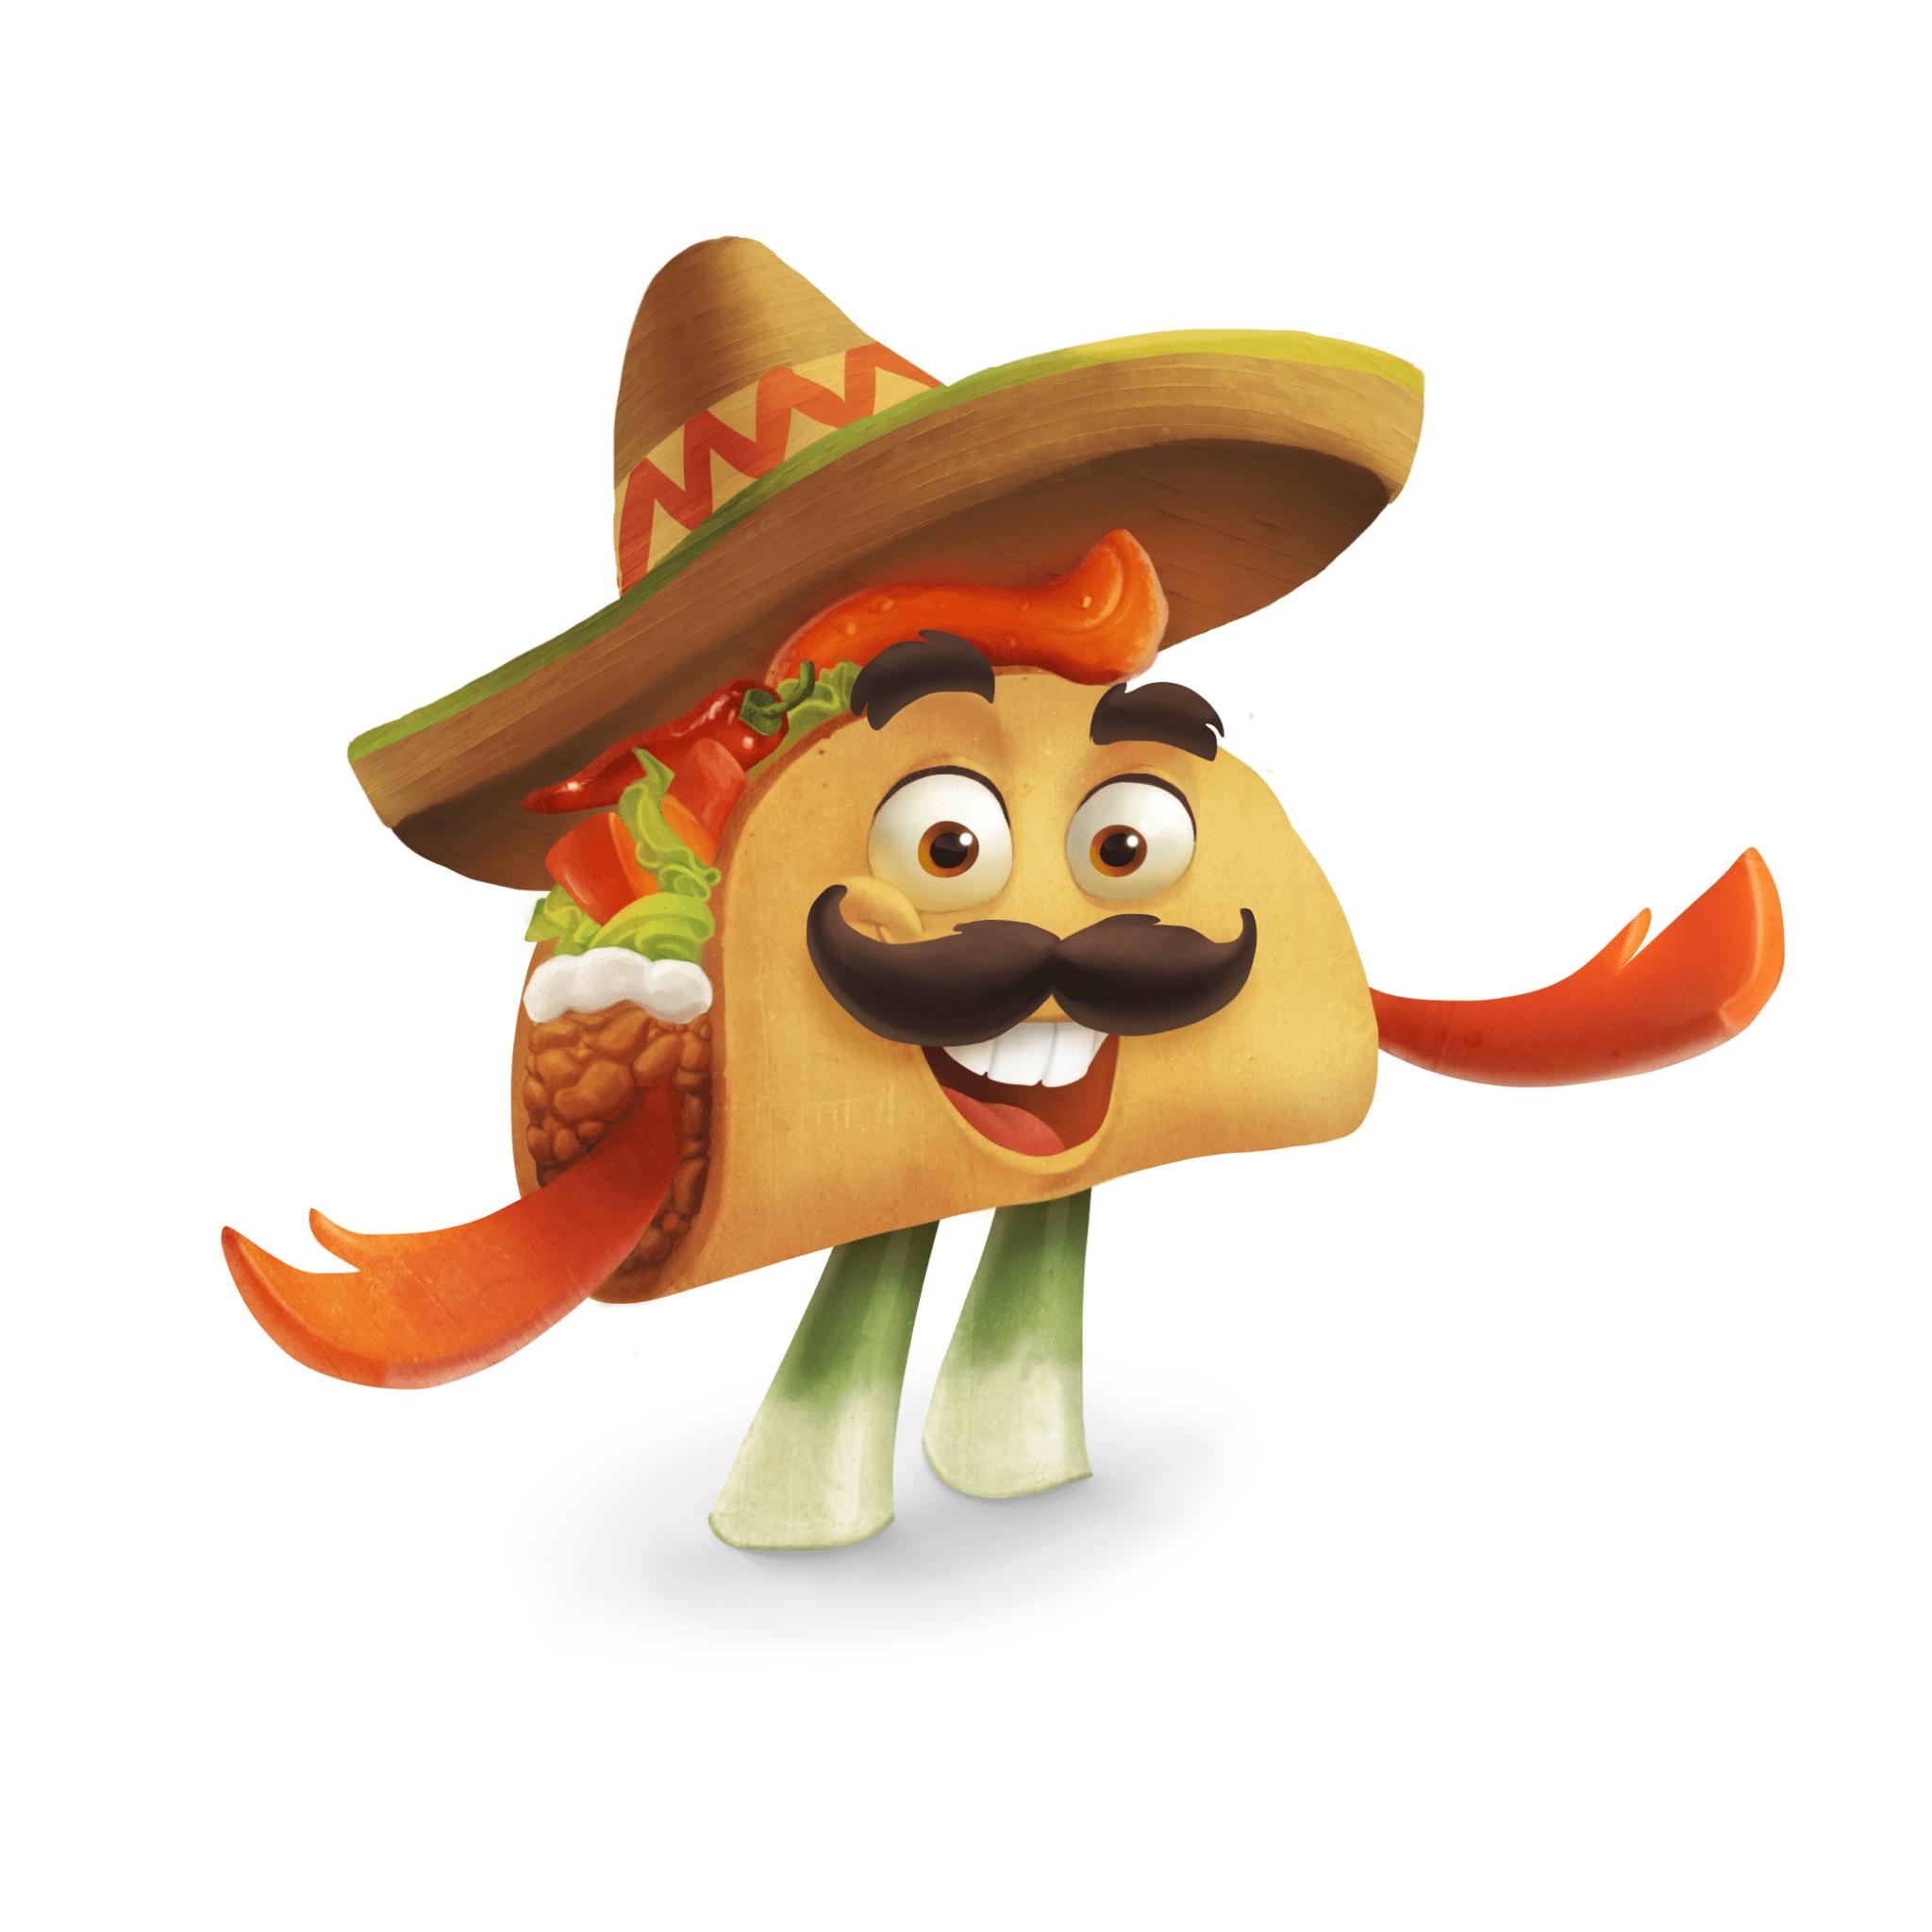 2D Taco Dude Food Character Illustration